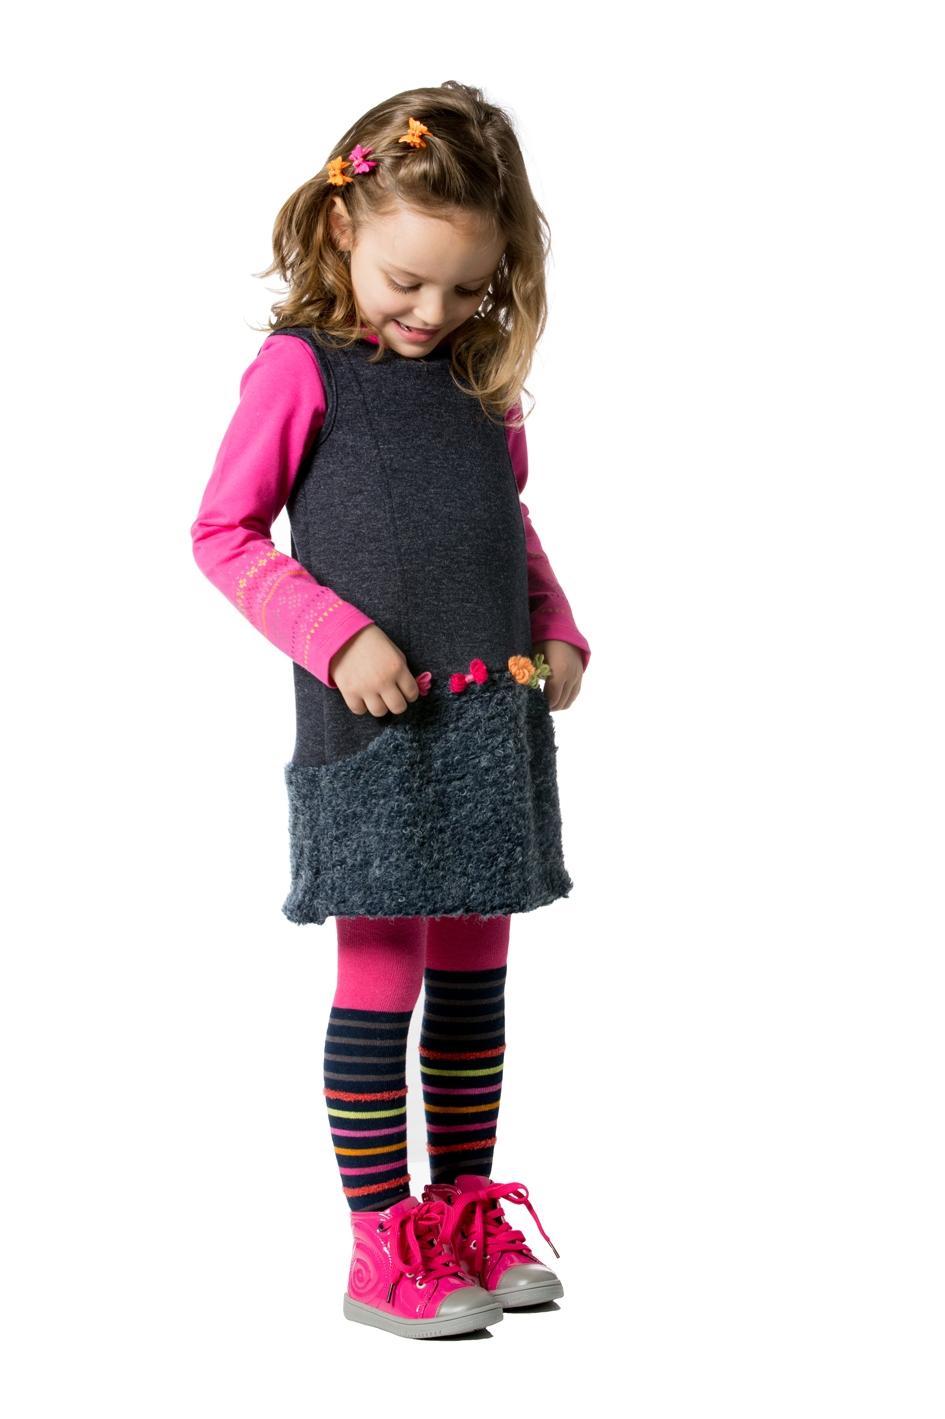 a8b4474ee2066 ملابس اطفال اولاد